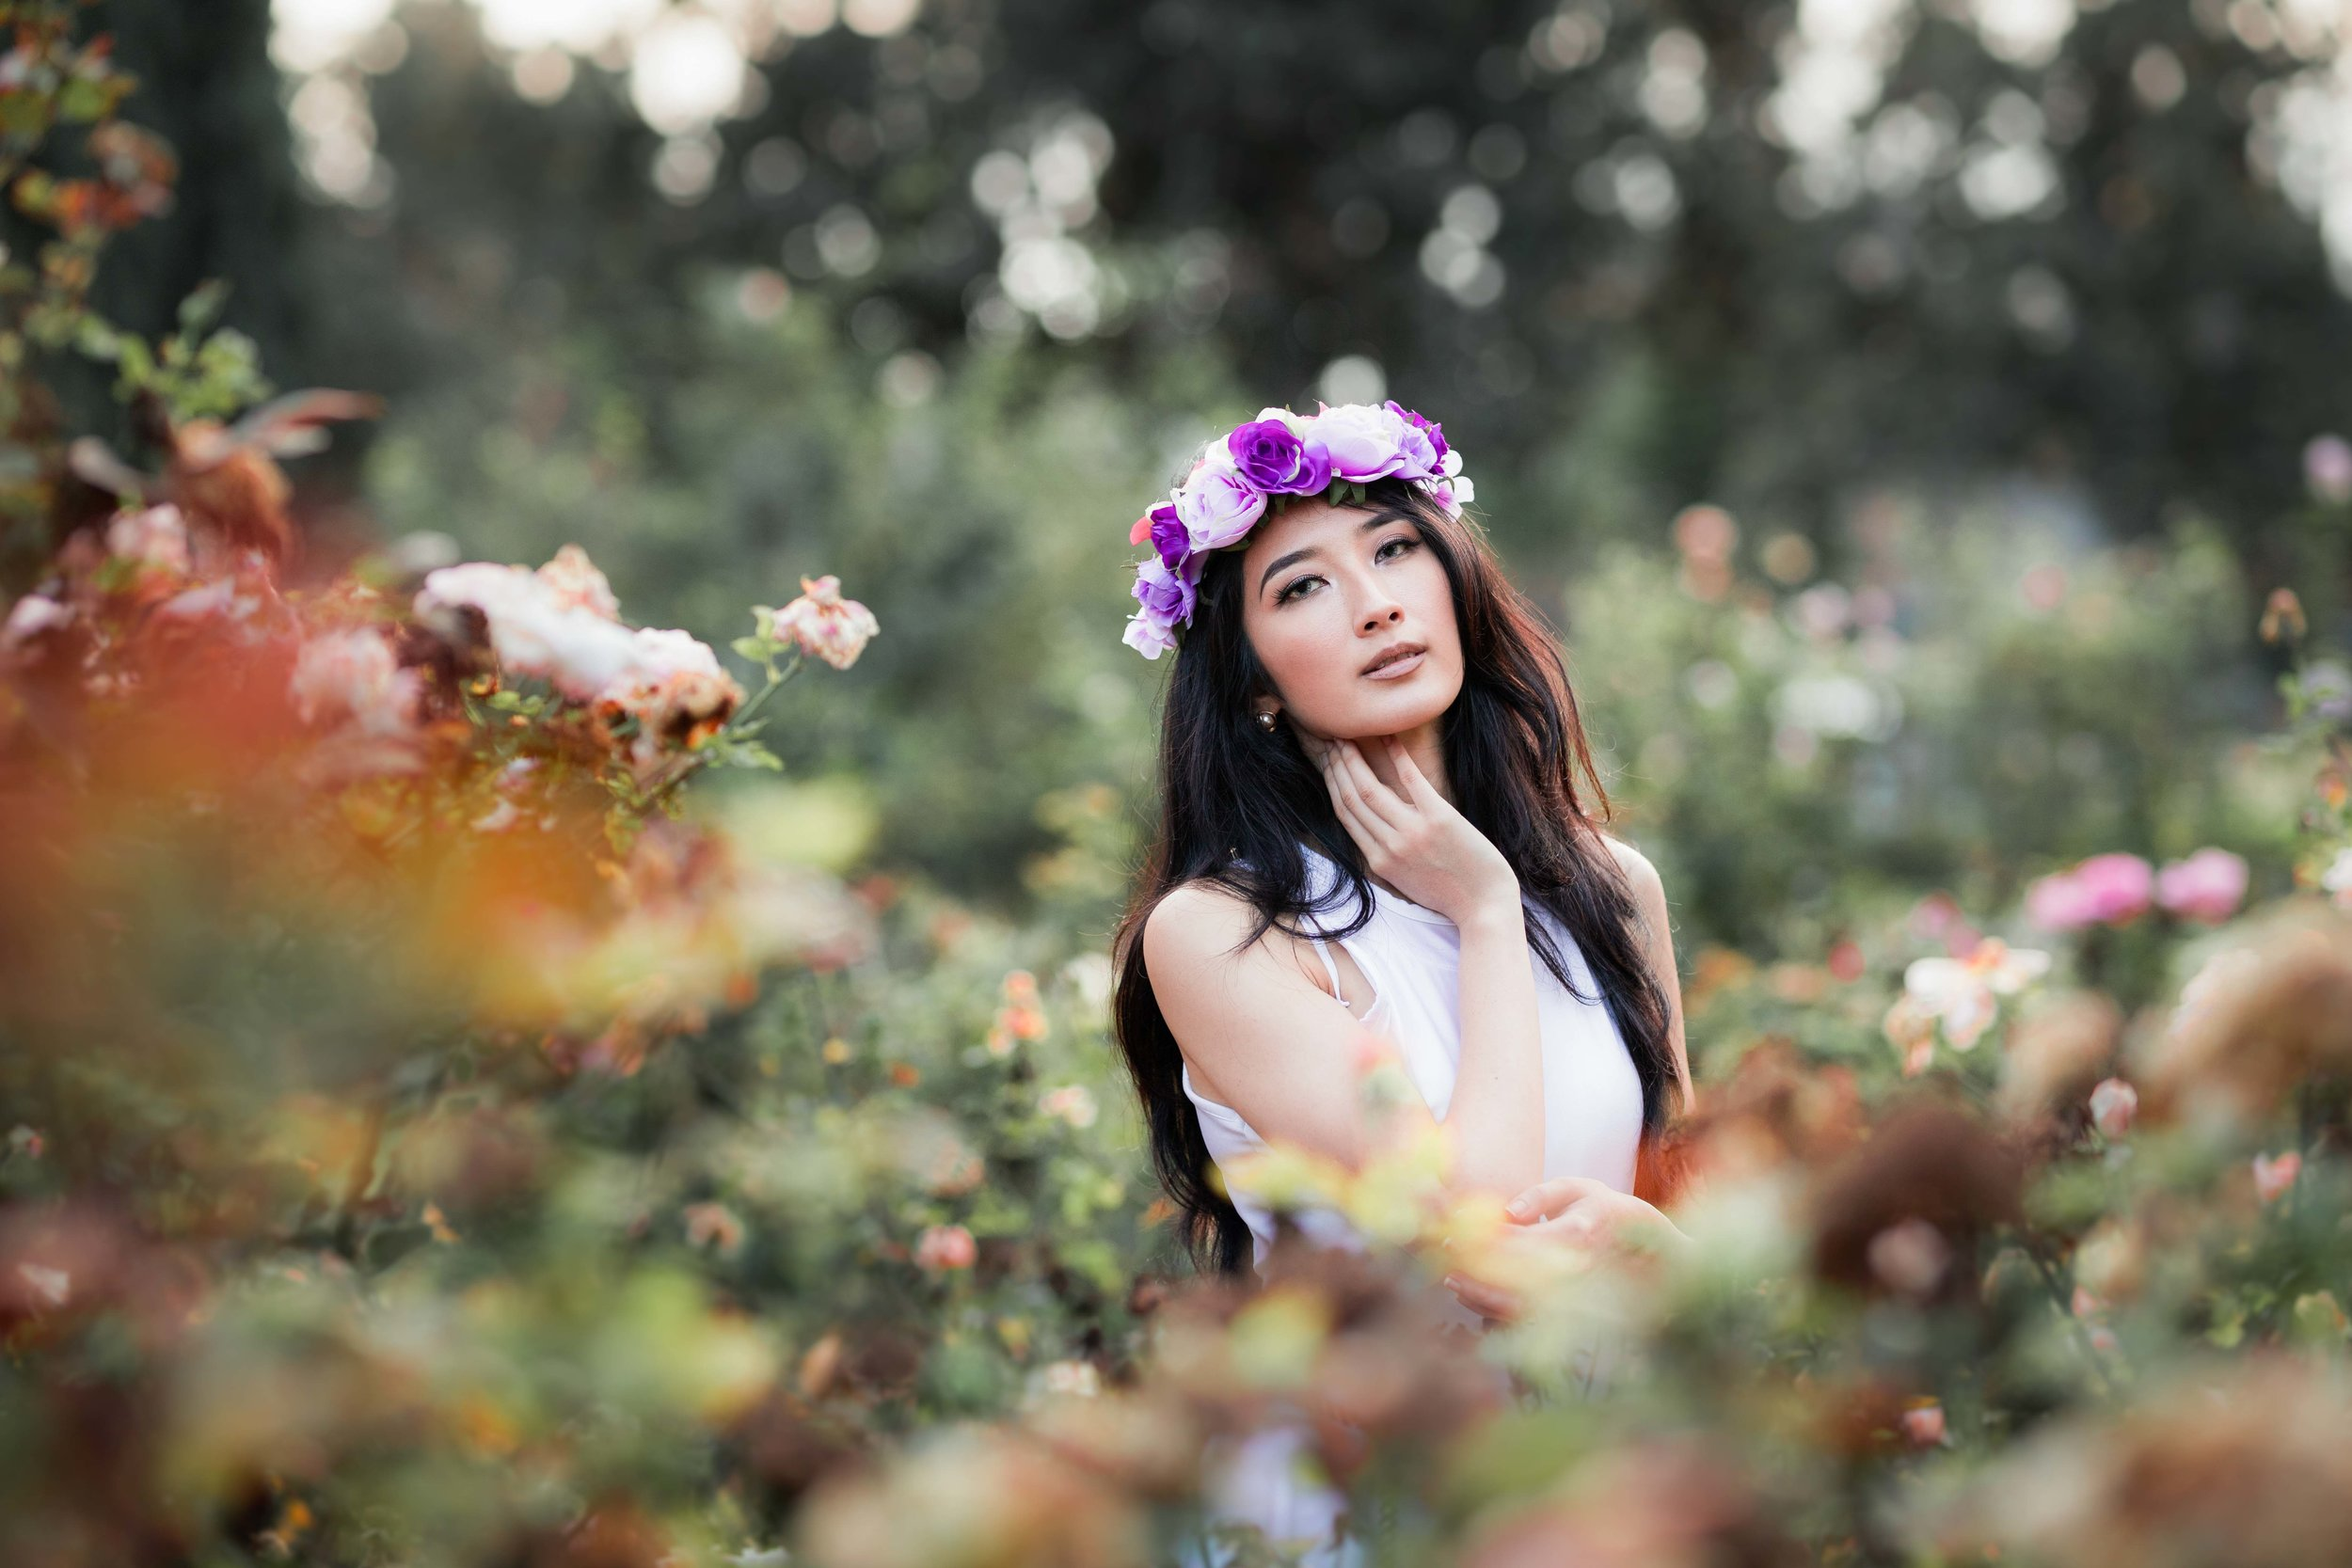 natural_portraiture_photosession_joshuachun.JPG